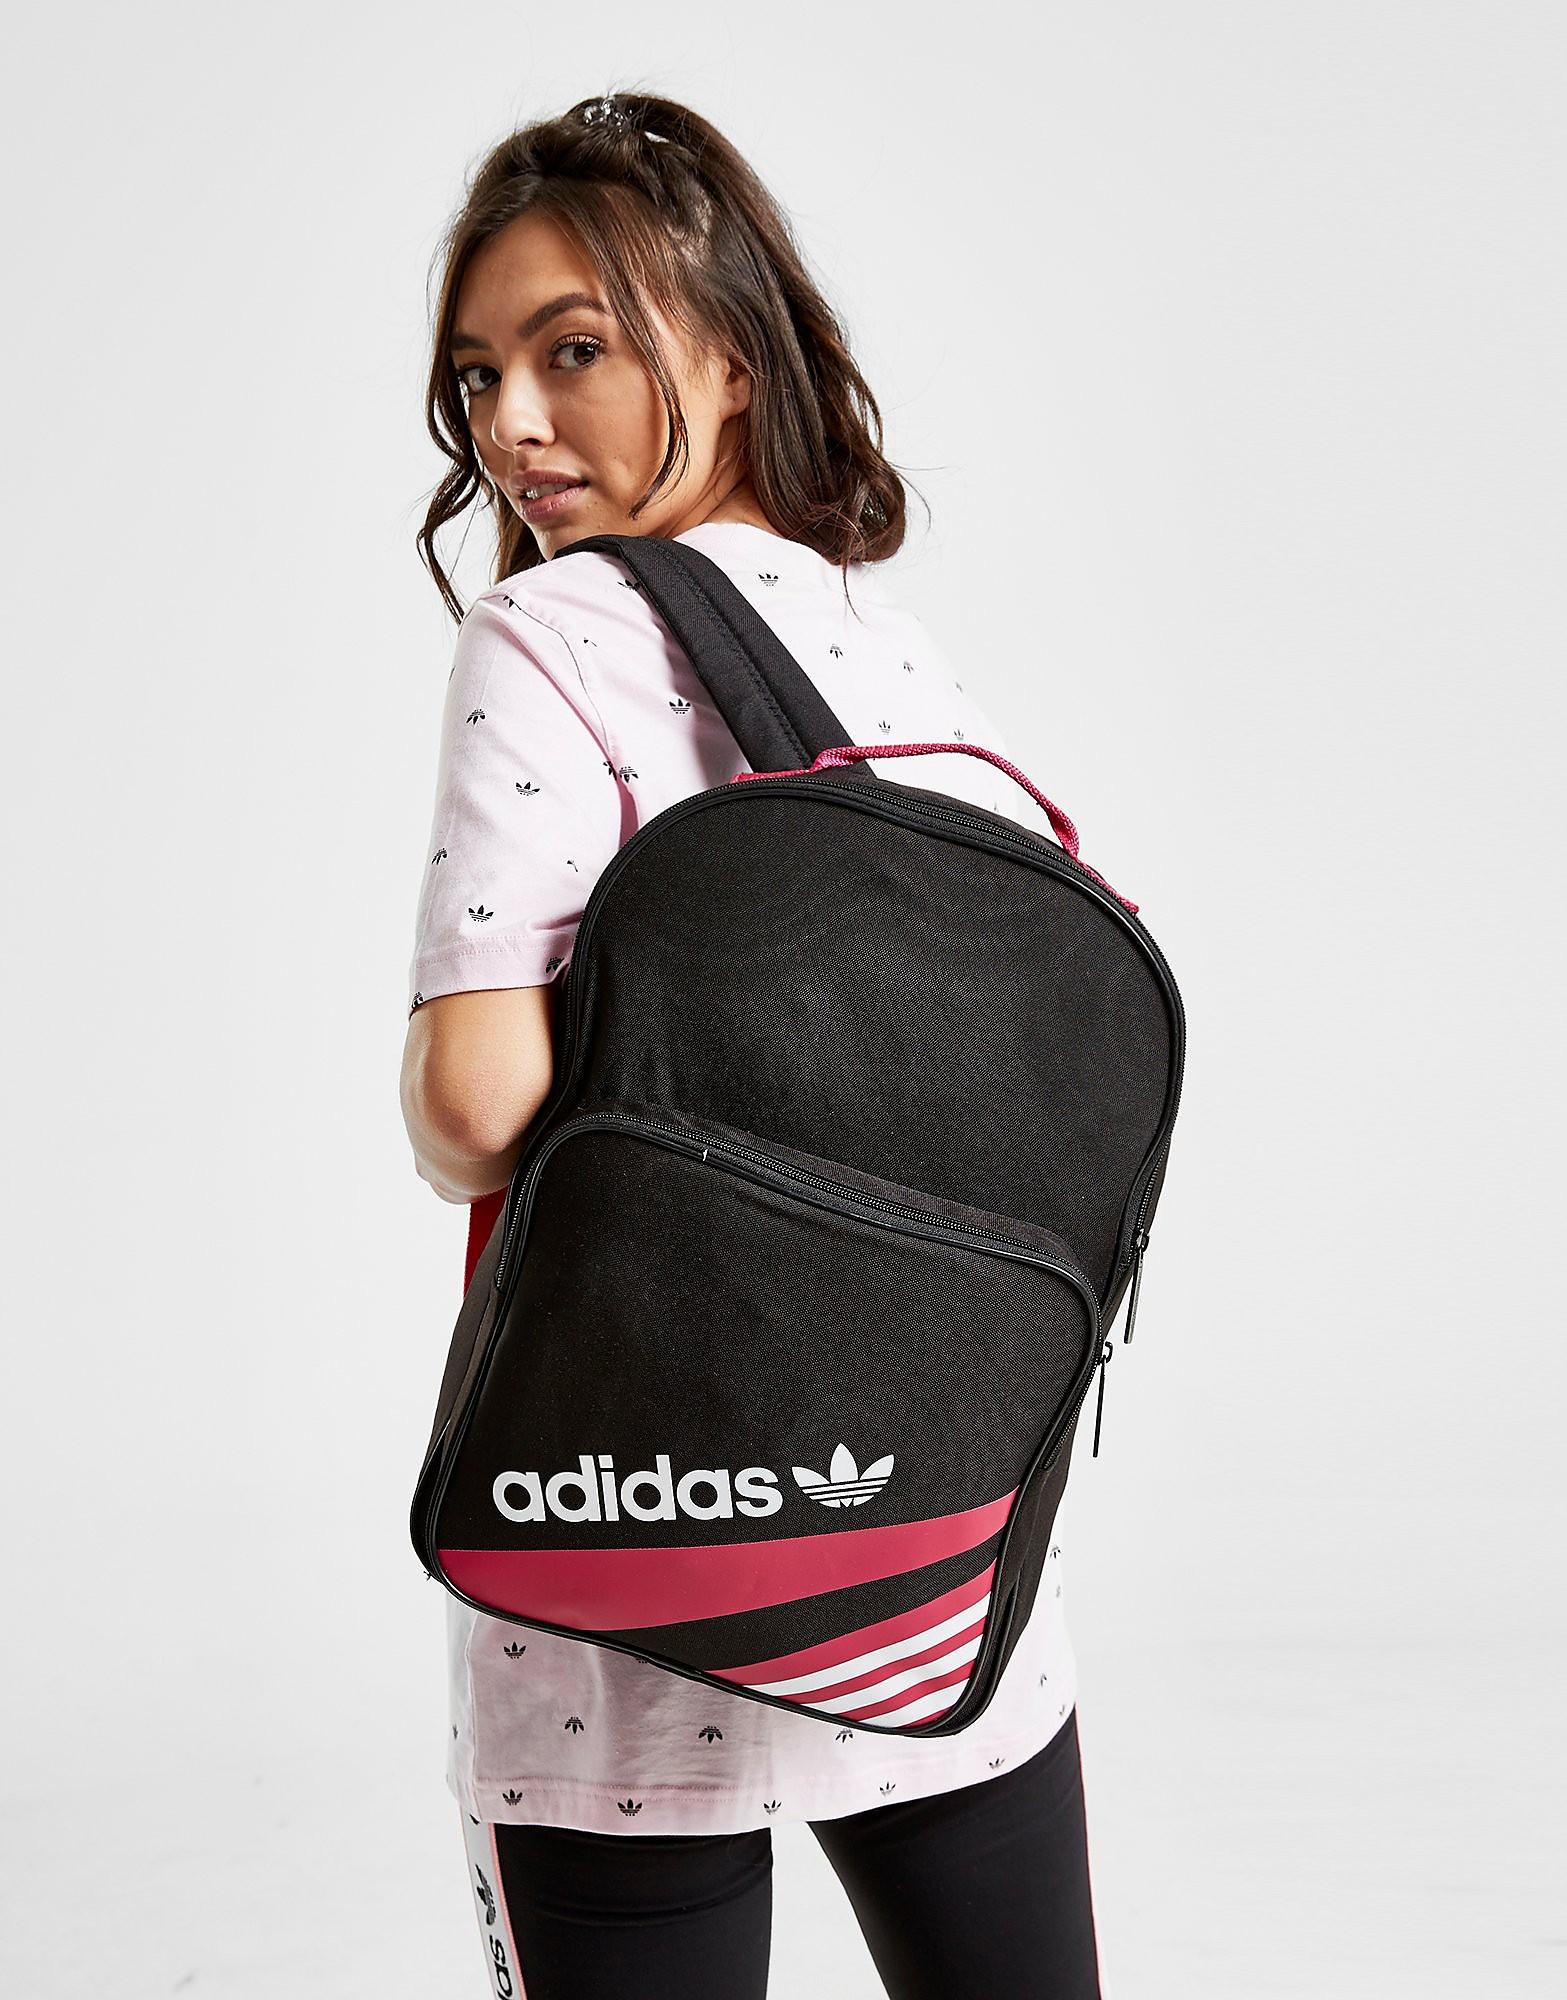 Adidas rugzak zwart, roze en wit